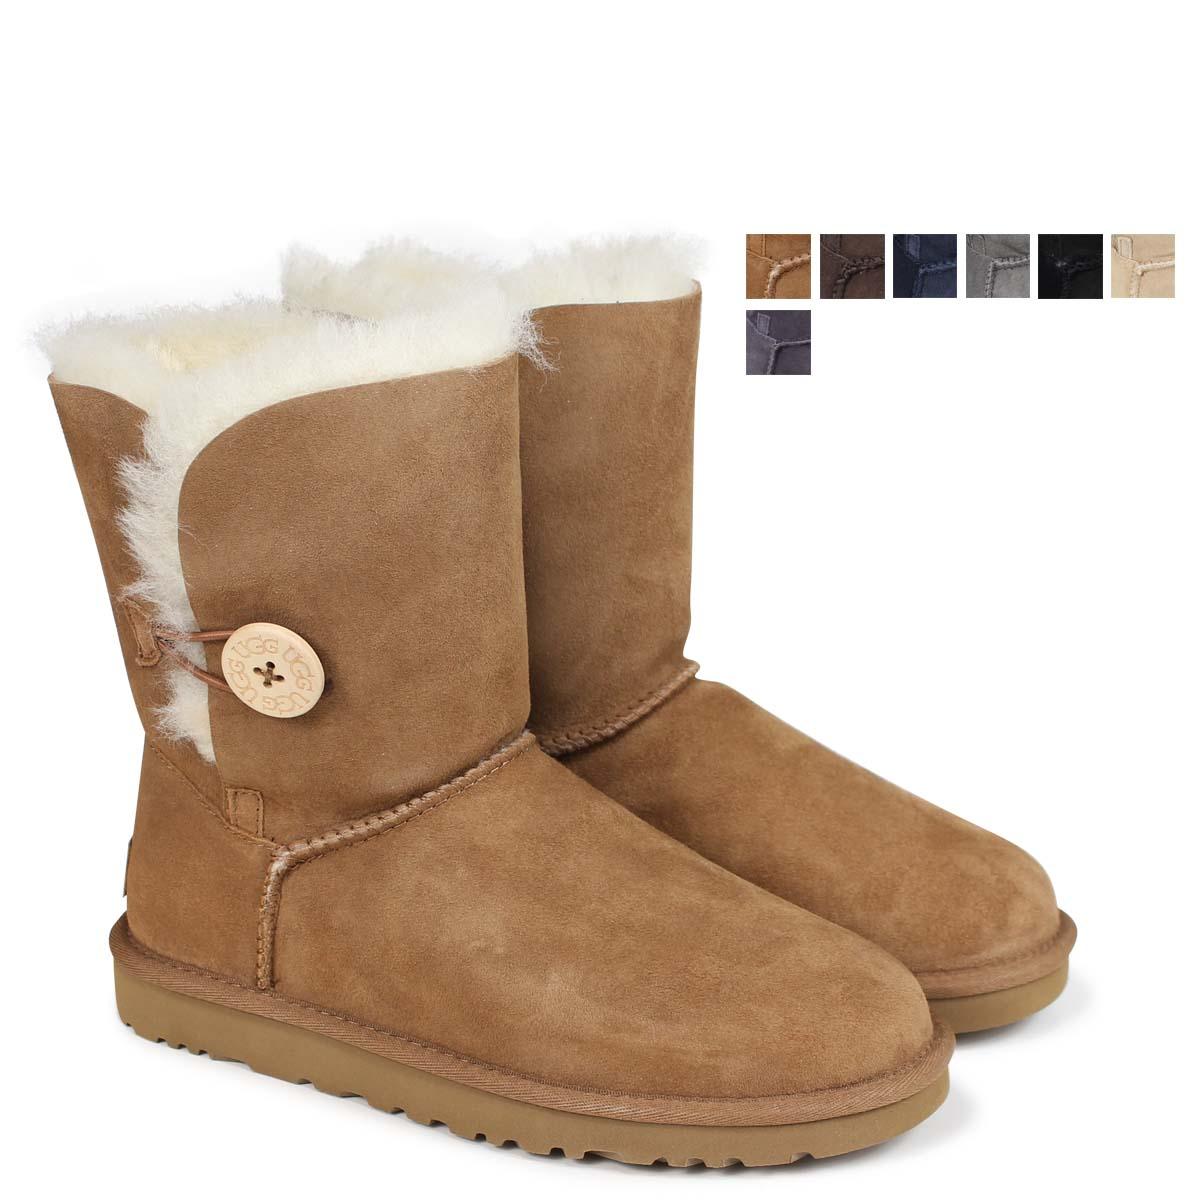 e6e5b132921 アグ UGG Lady's WOMENS BAILEY BUTTON II mouton boots Bailey button 2 5803  1016226